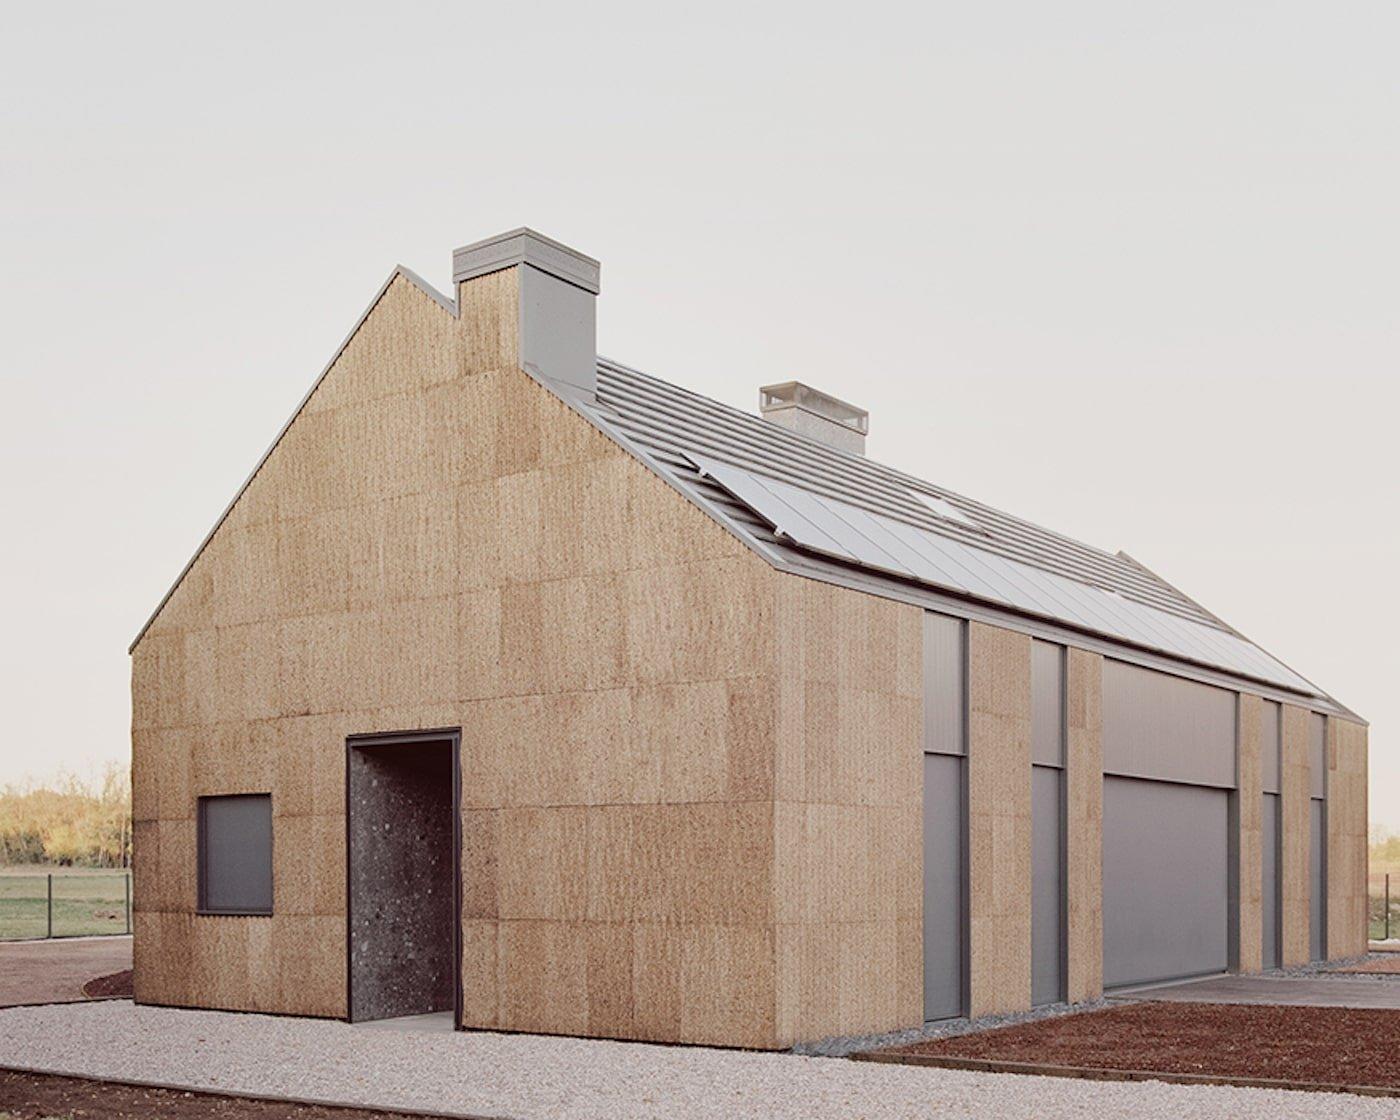 Cork cladding, solar panels on roof